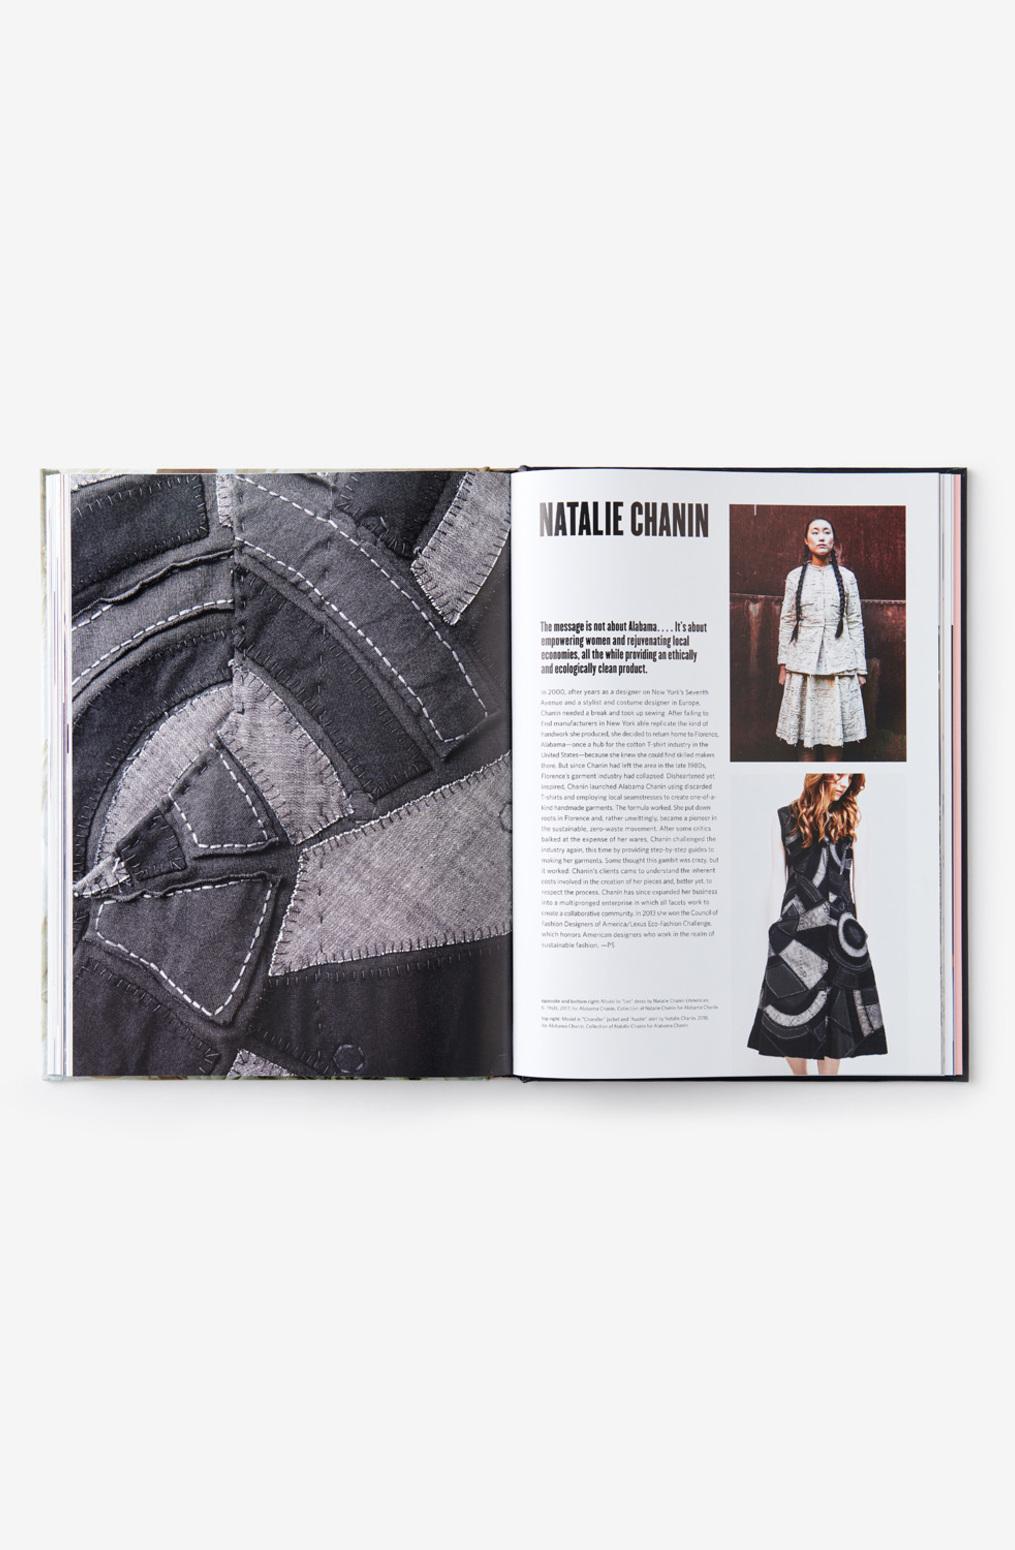 Alabama chanin the women who revolutionized fashion peabody essex museum 4